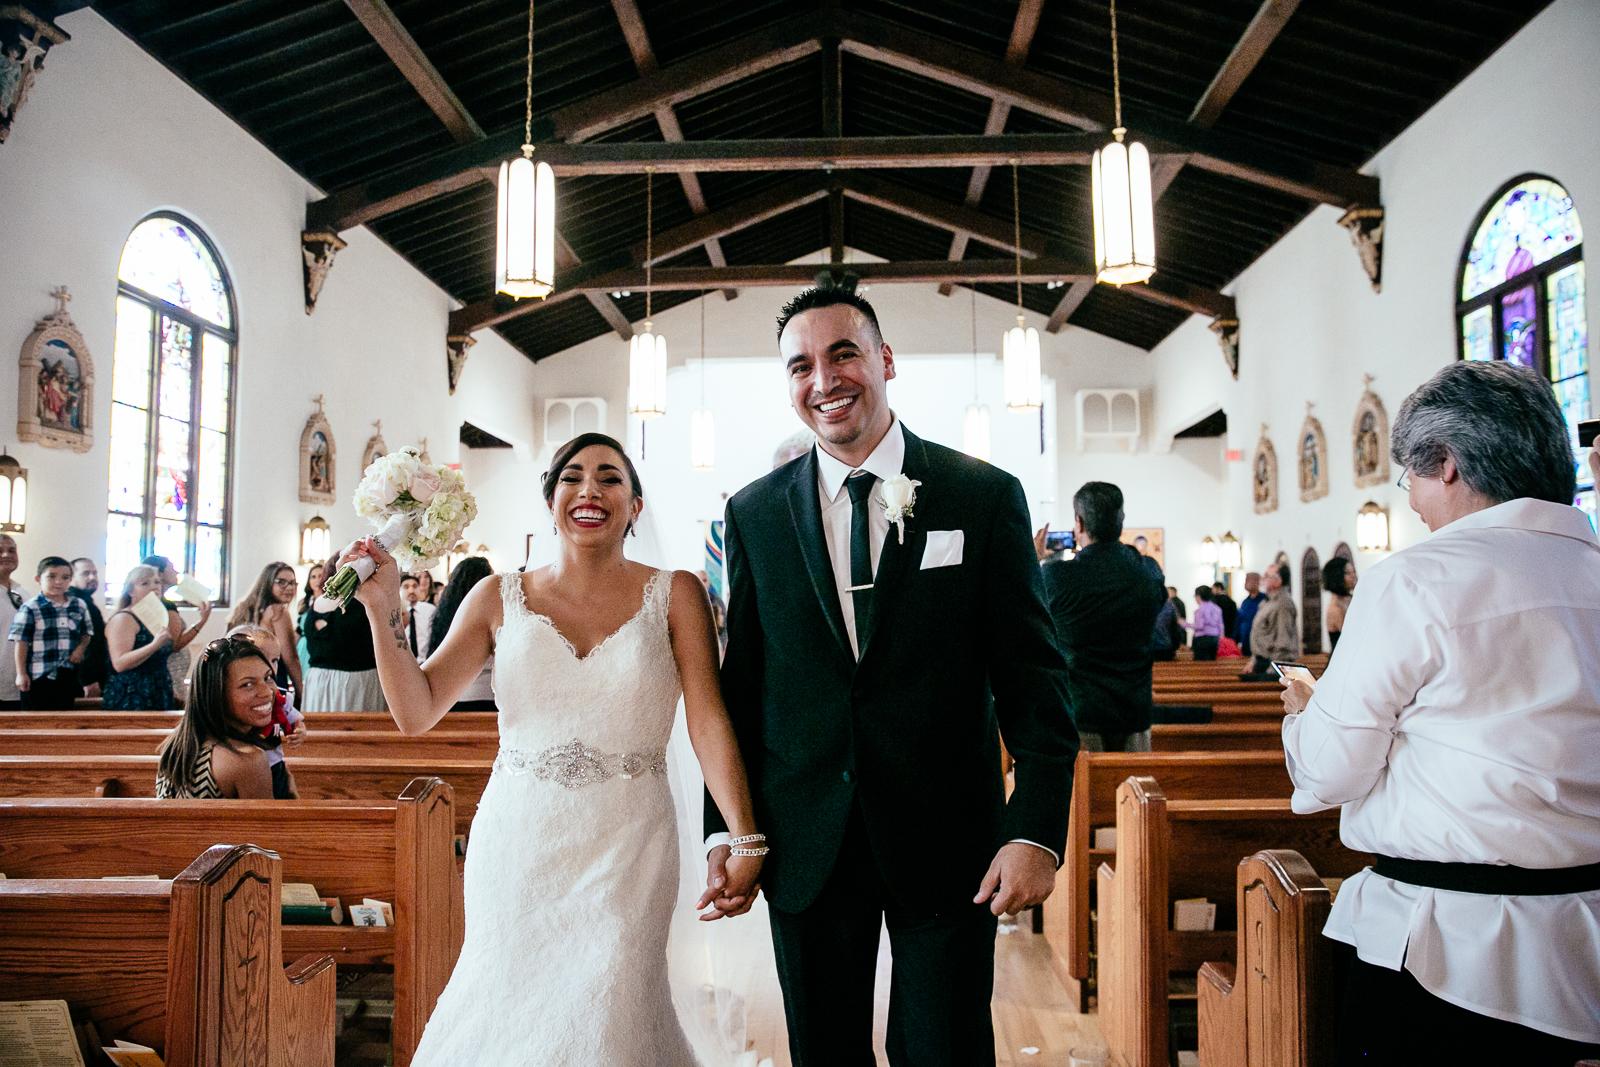 ANGELINE_&_JESUS_WEDDING_LAFAYETTE_HOTEL_2015_2015_IMG_3044.JPG